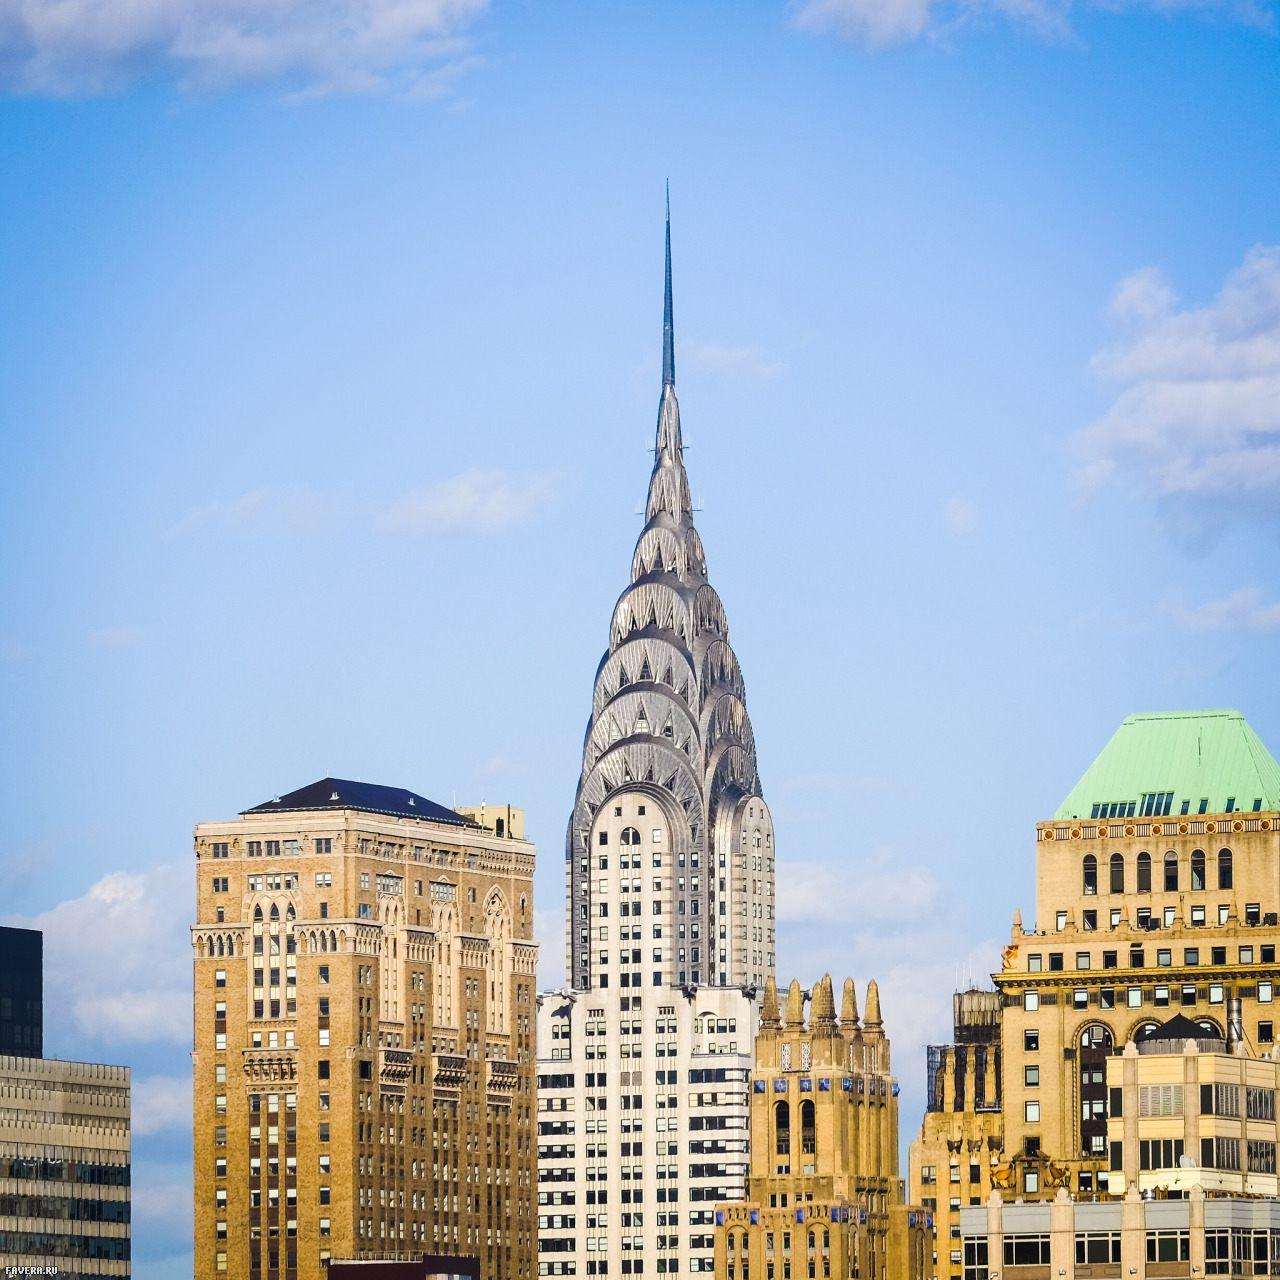 Архитектура Нью-Йорка. Ар-деко и Крайслер билдинг | proBauhaus.ru